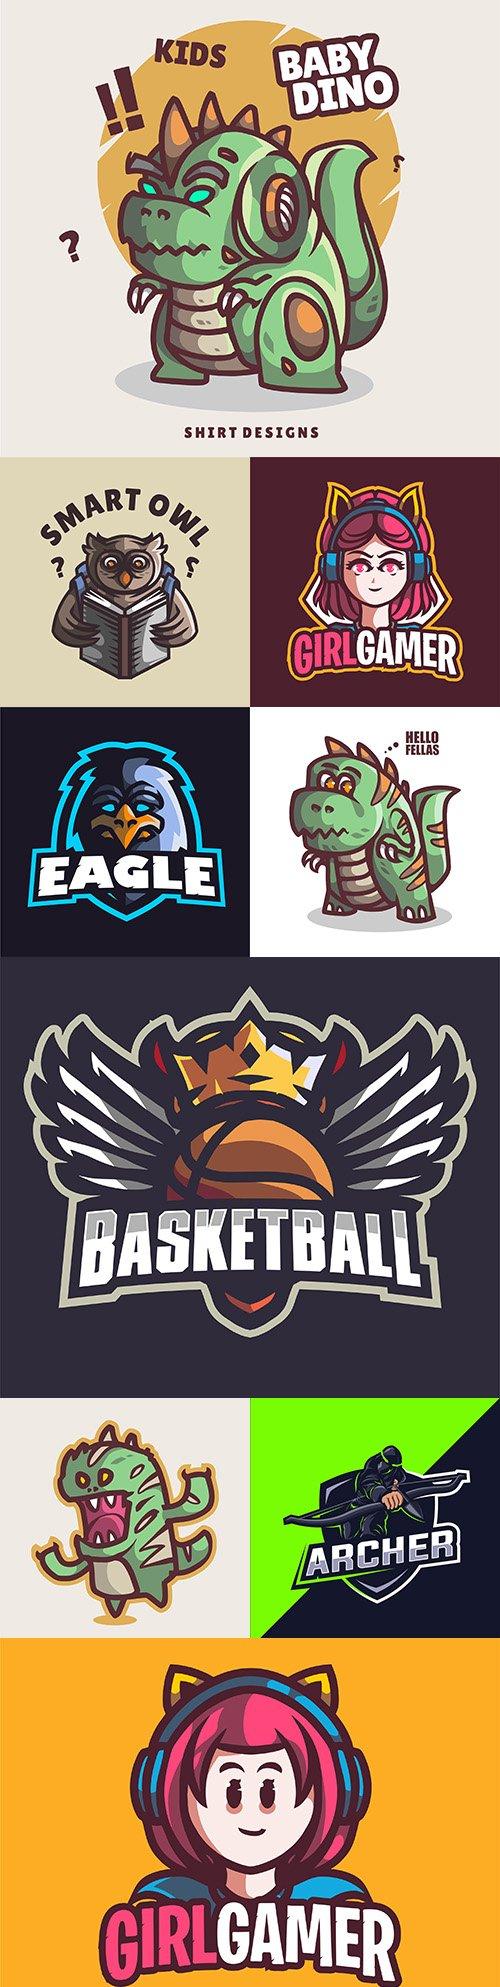 Emblem mascot and Brand name logos design